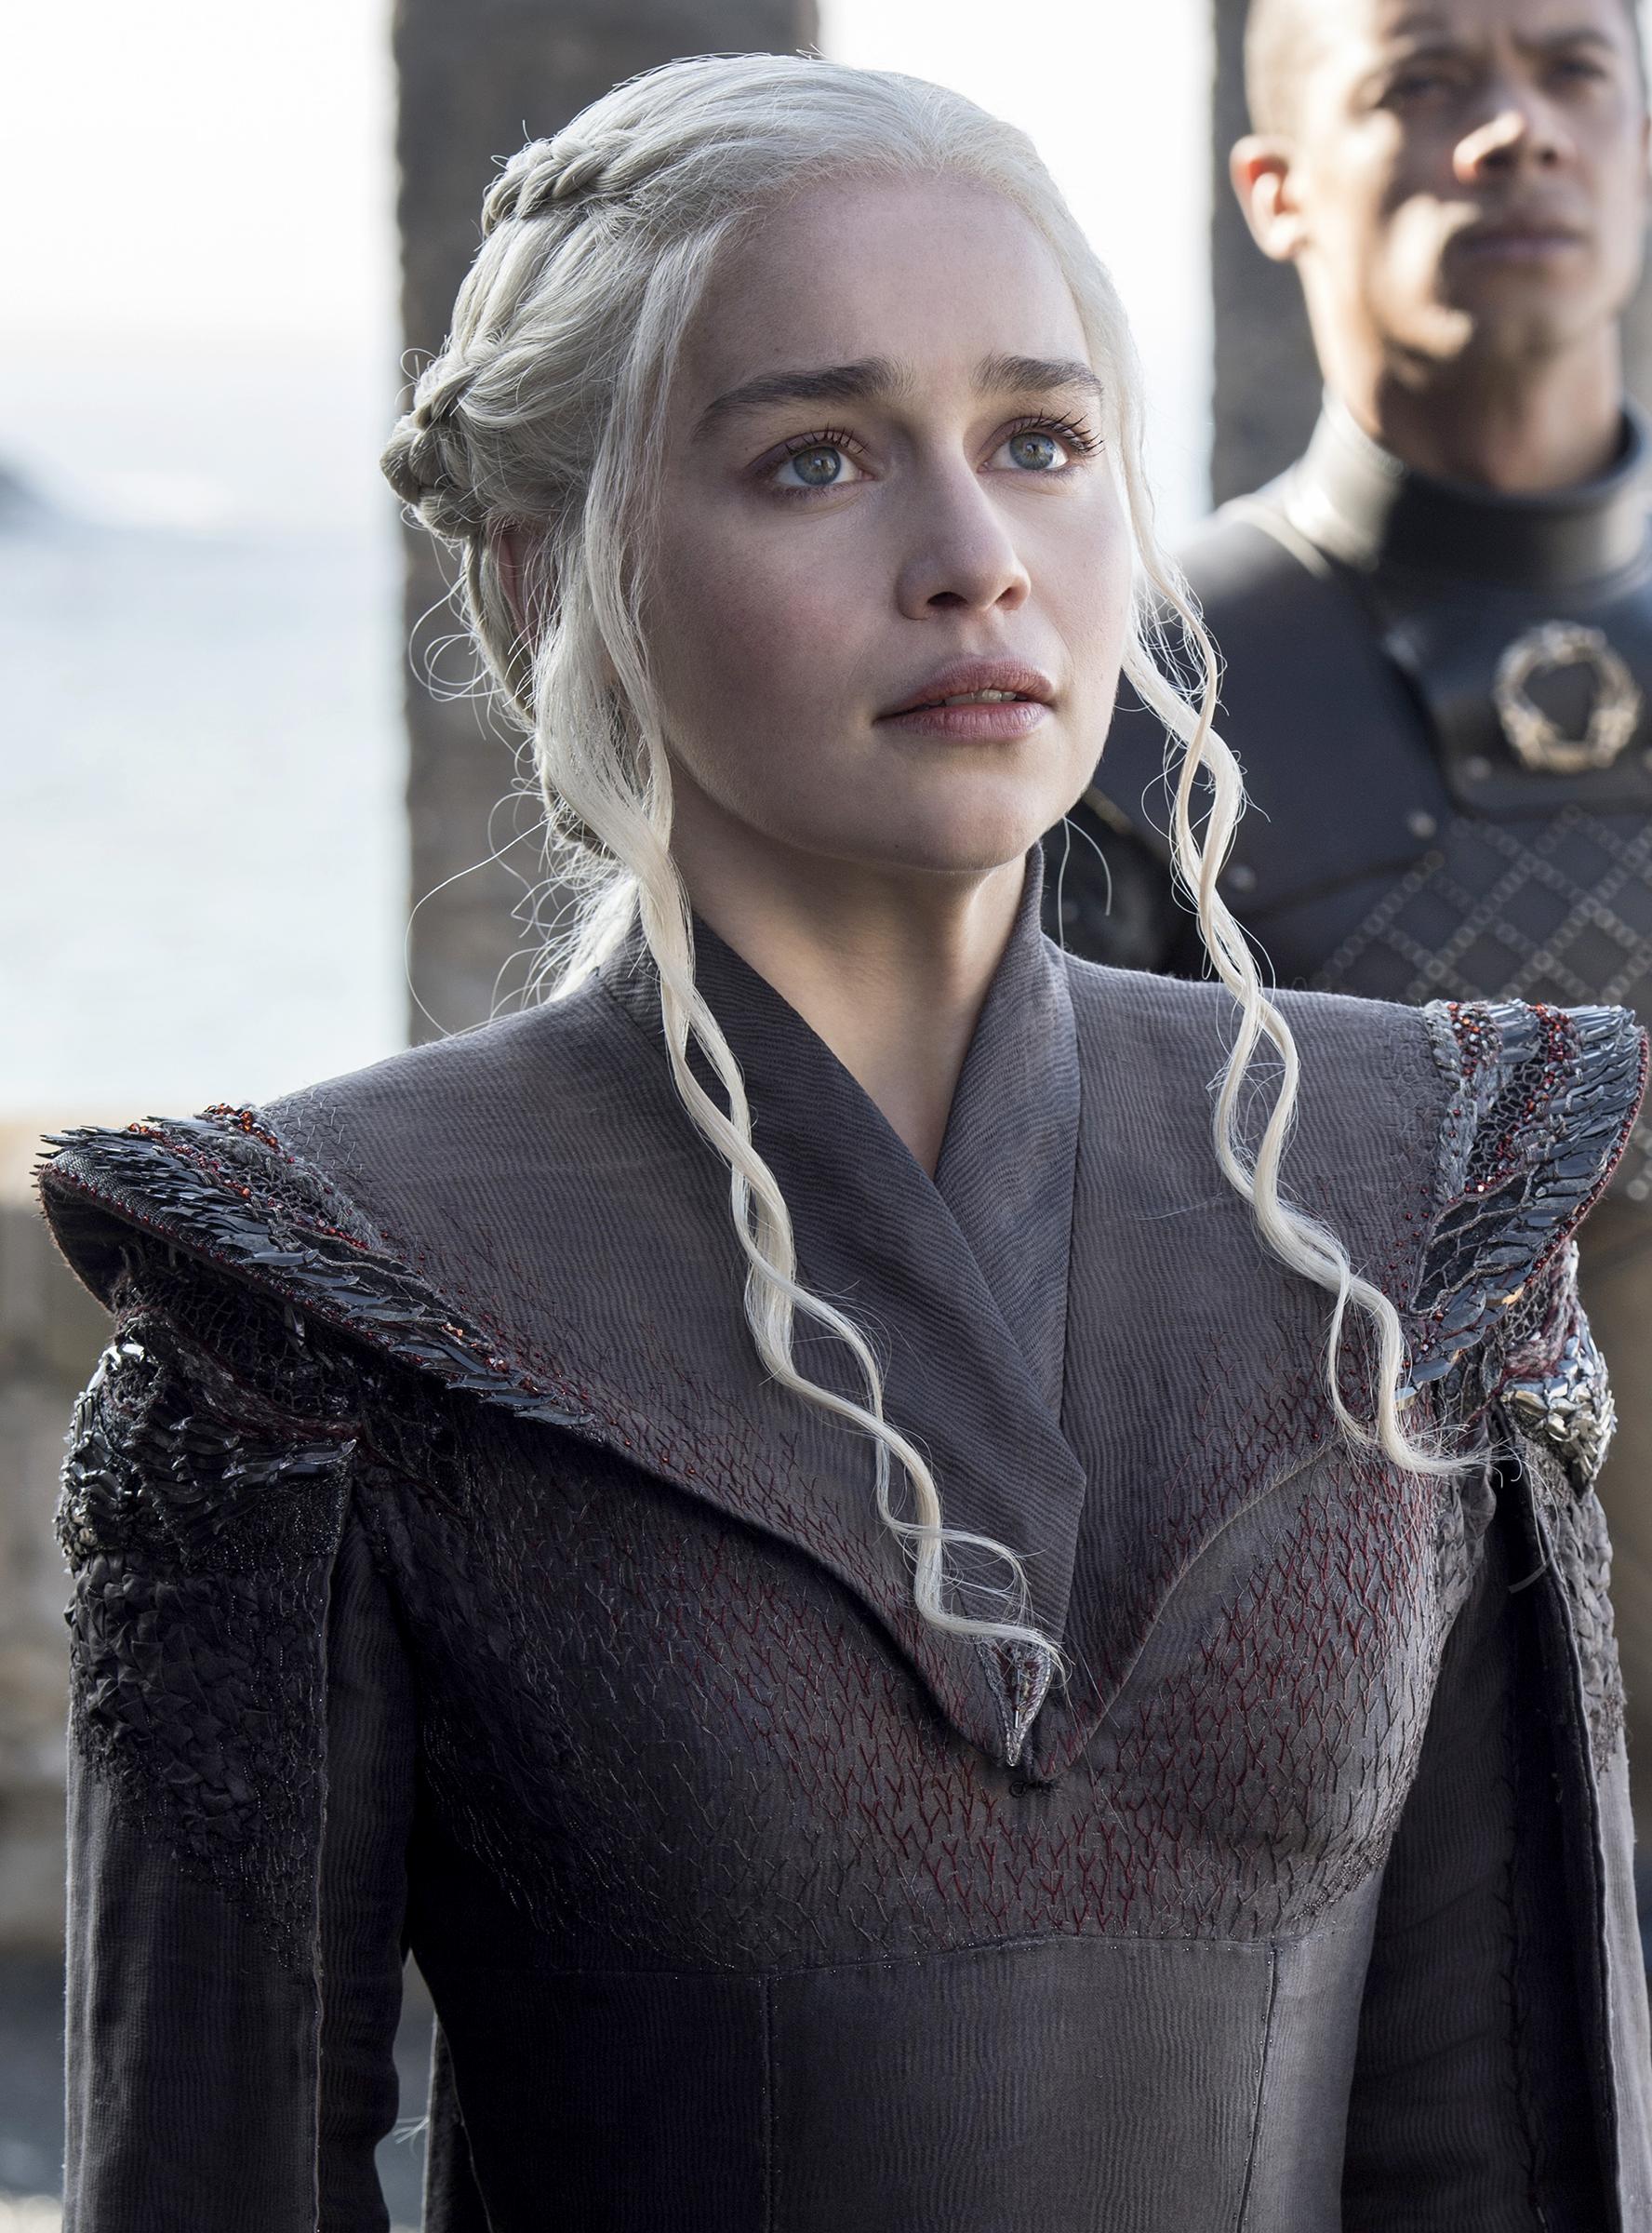 Torrent Game Of Thrones S08e05 : torrent, thrones, s08e05, Sorry,, Thrones', Won't, Throne, Season, Daenerys